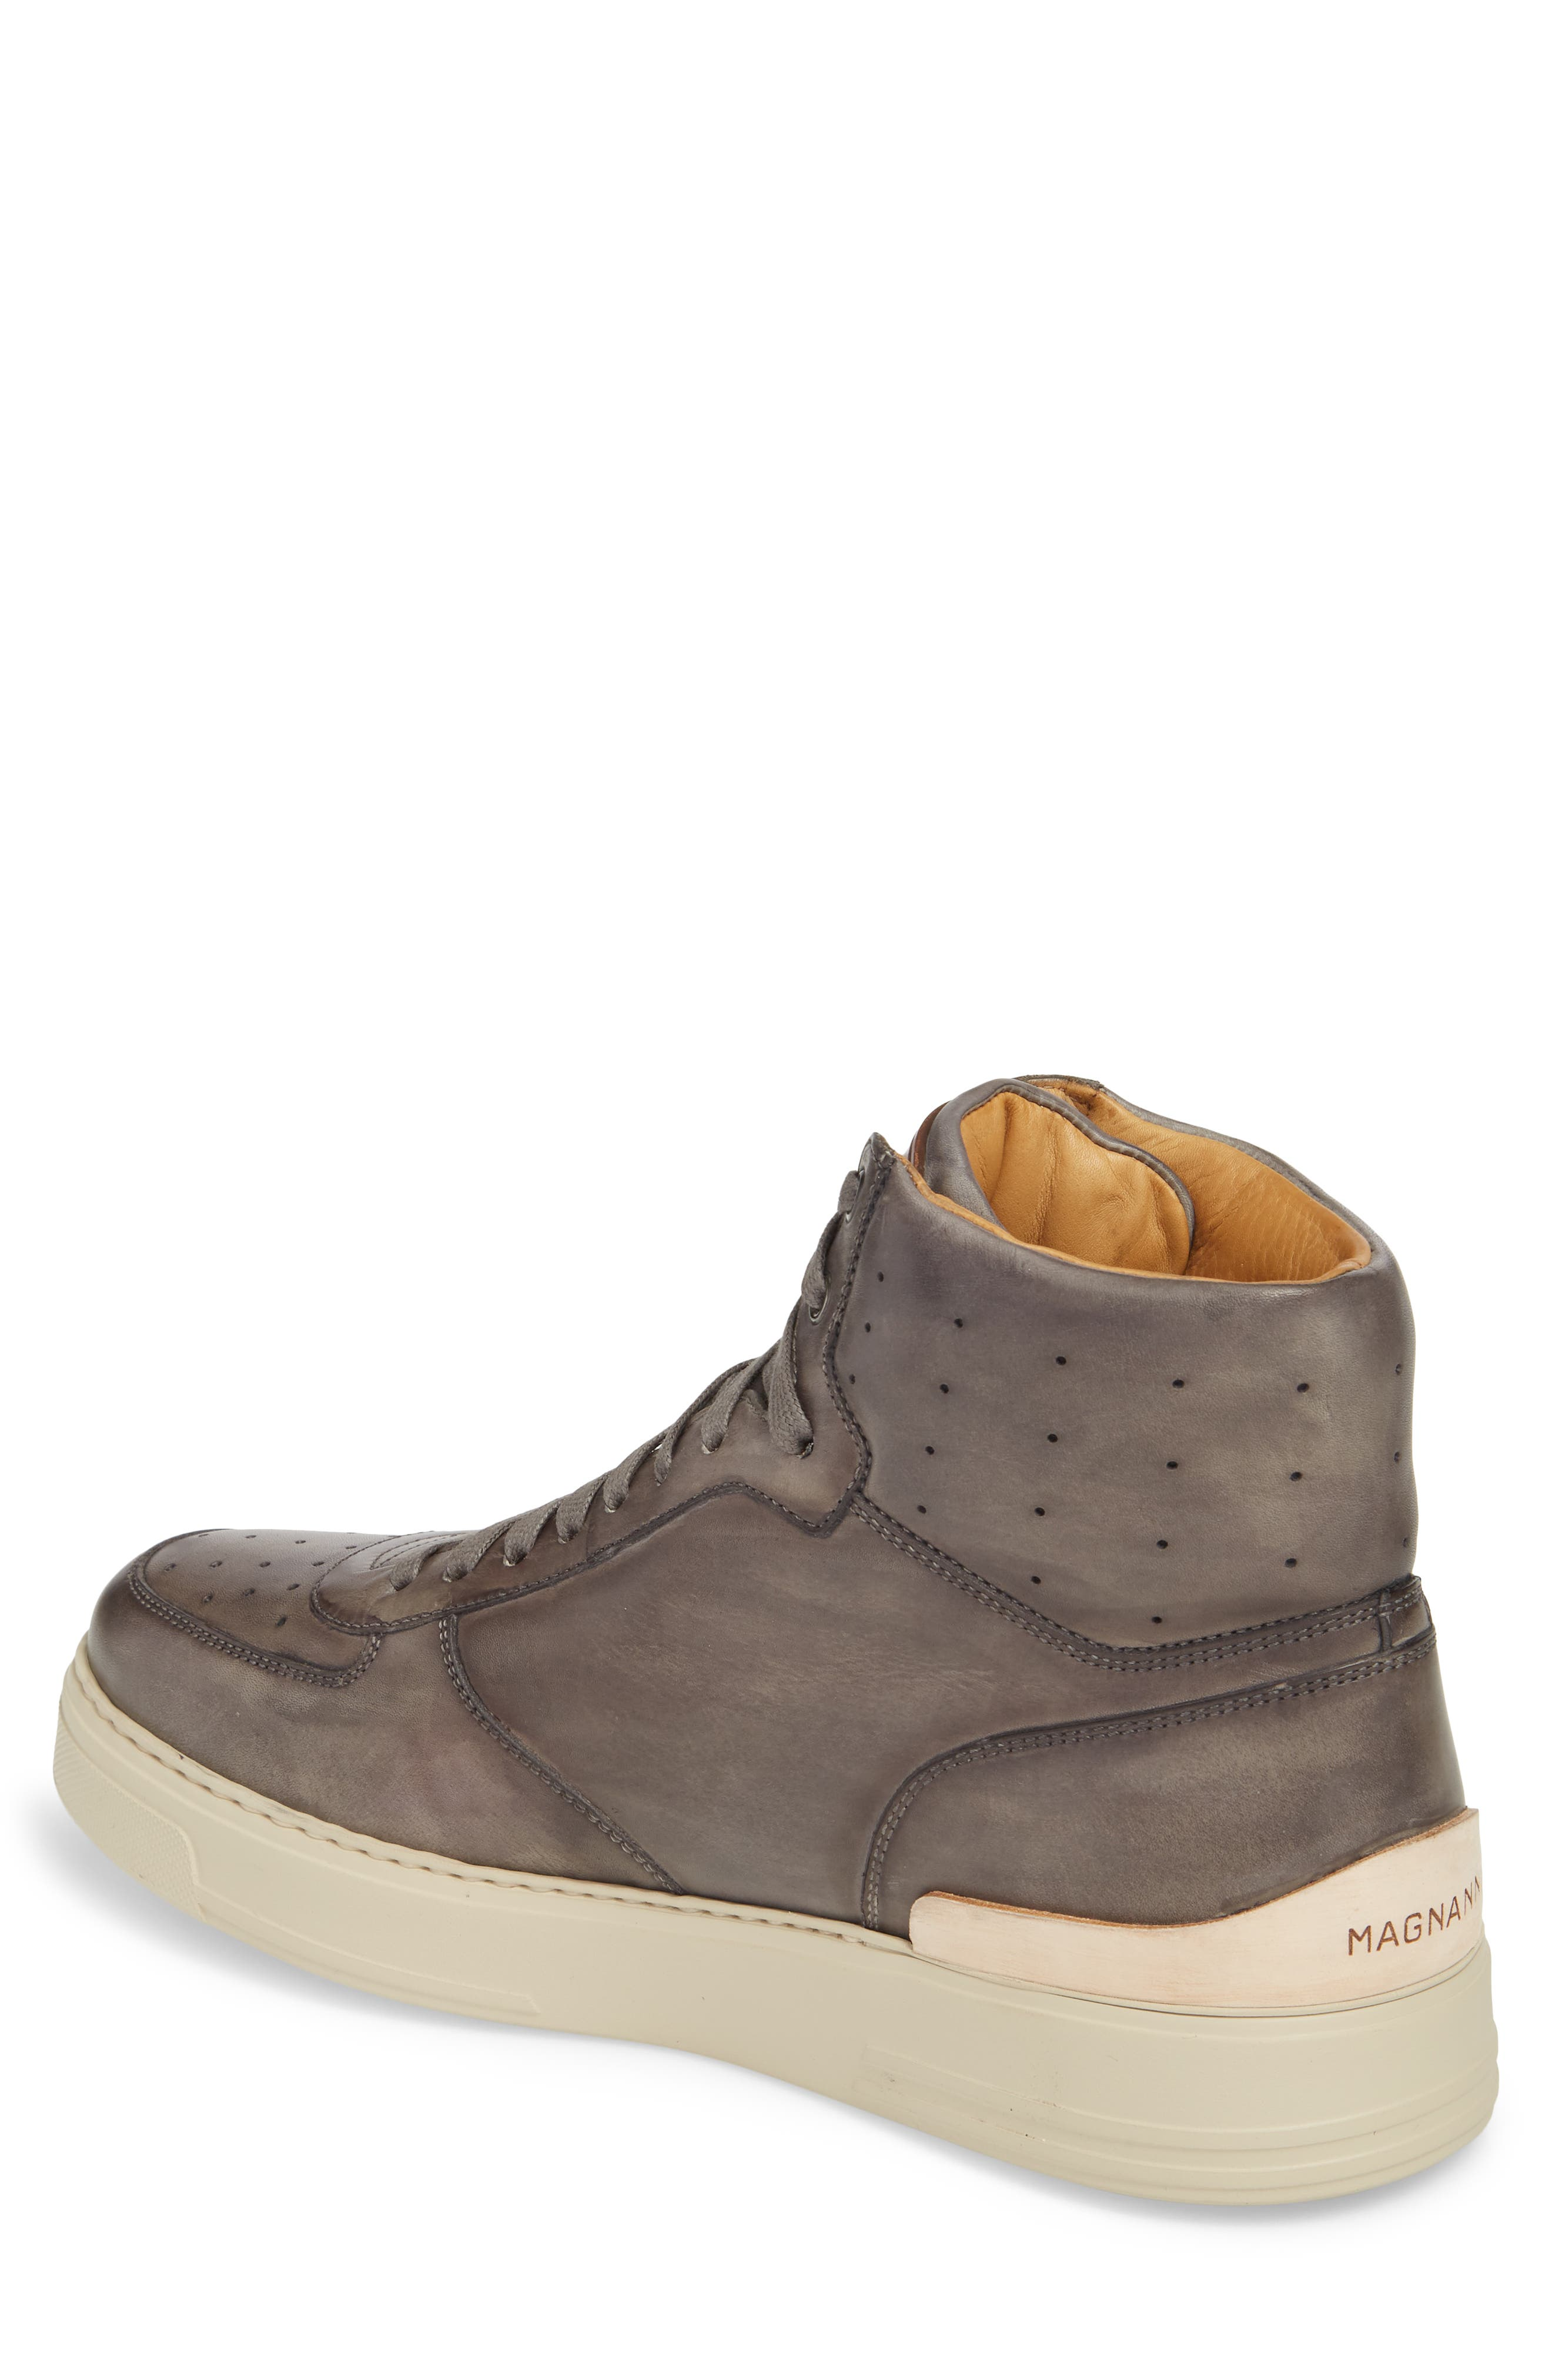 Varro Hi Top Lace Up Sneaker,                             Alternate thumbnail 2, color,                             021